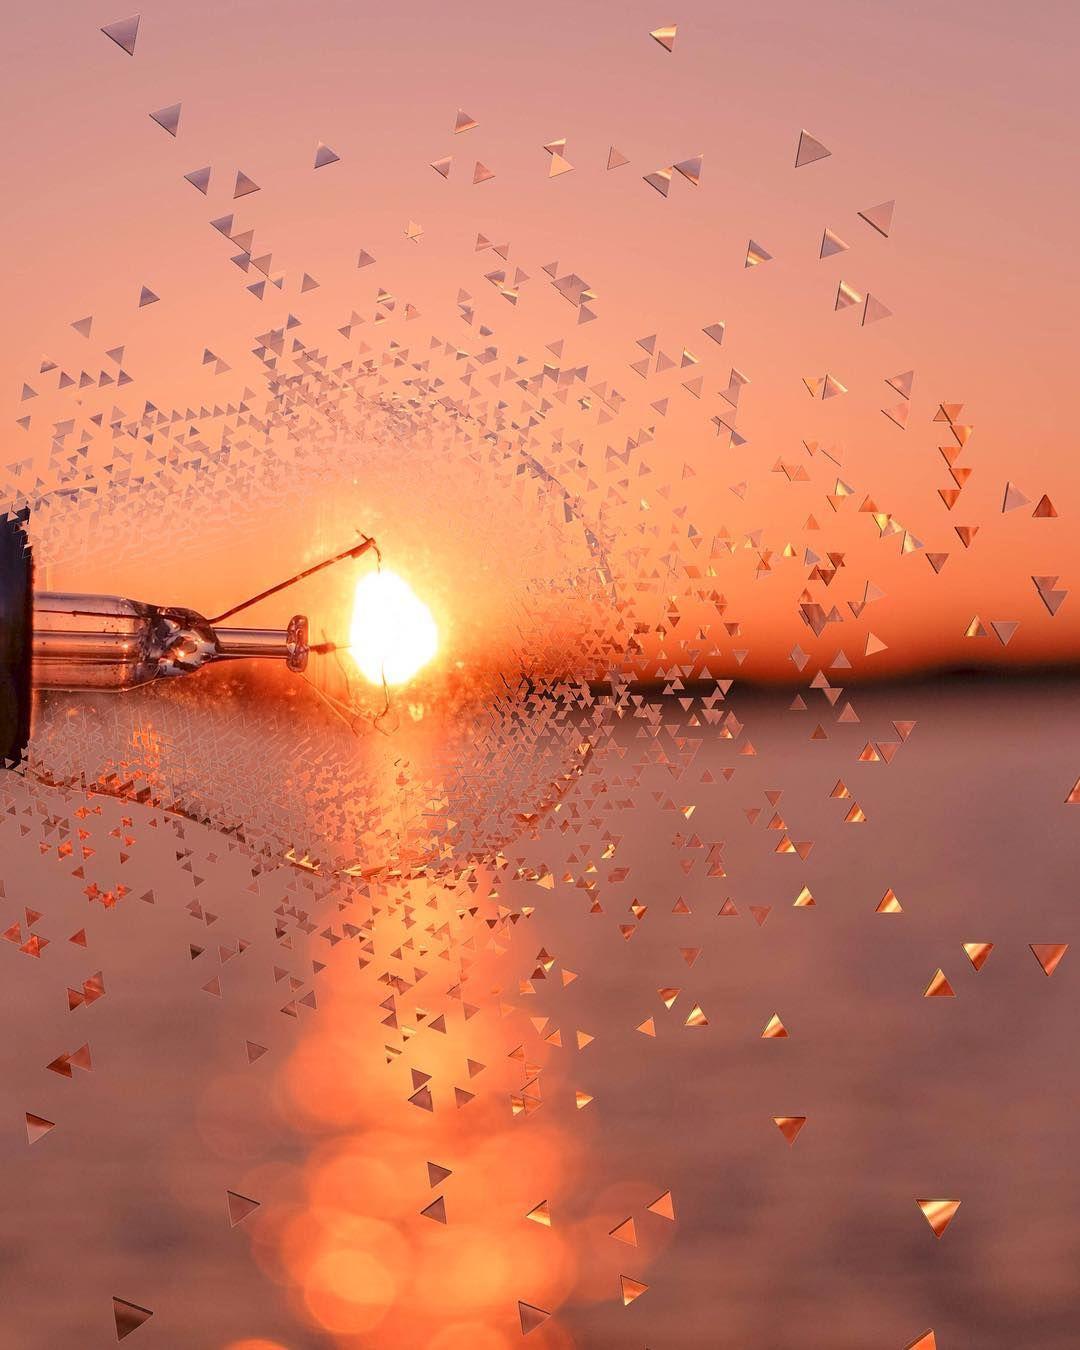 Creative Sunset Photography By Dhruba Sunset Photography Landscape Photography Nature Surreal Photos